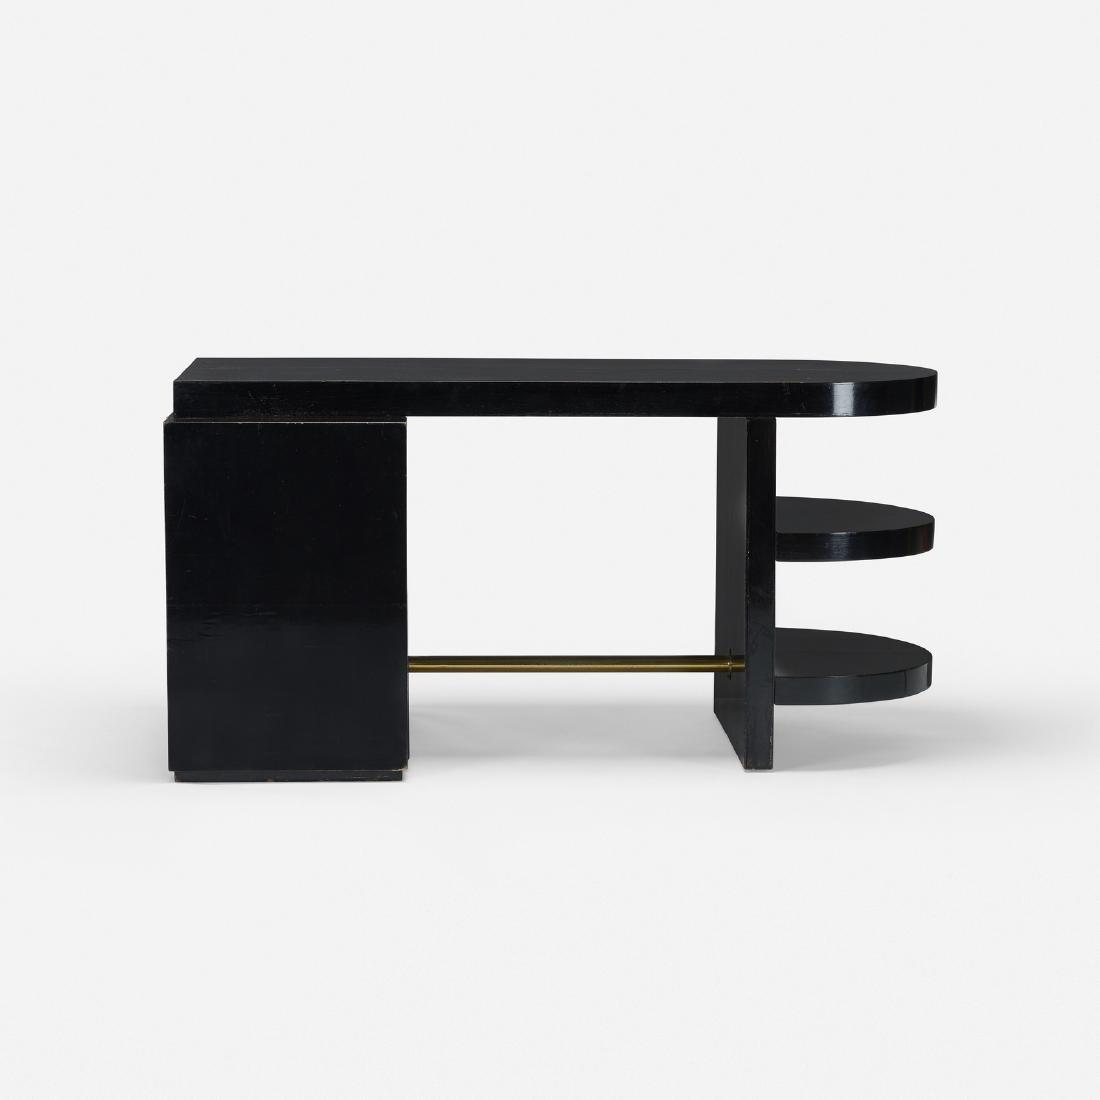 Gino Levi Montalcini, attribution, desk